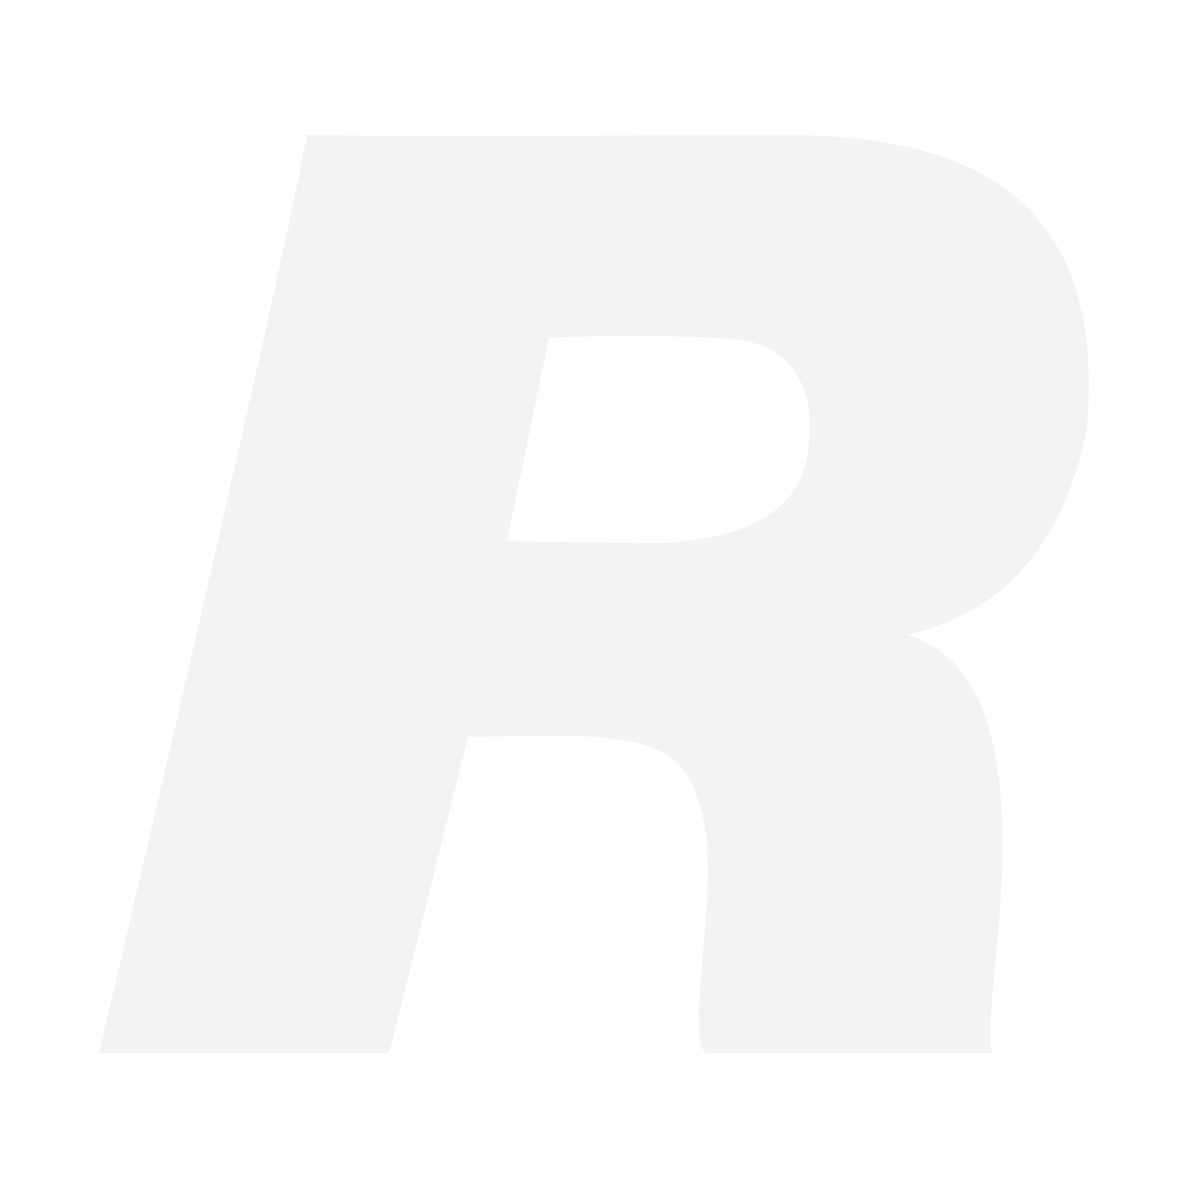 CANON EOS 1DX RUNKO KÄYTETTY (SIS. ALV24%)